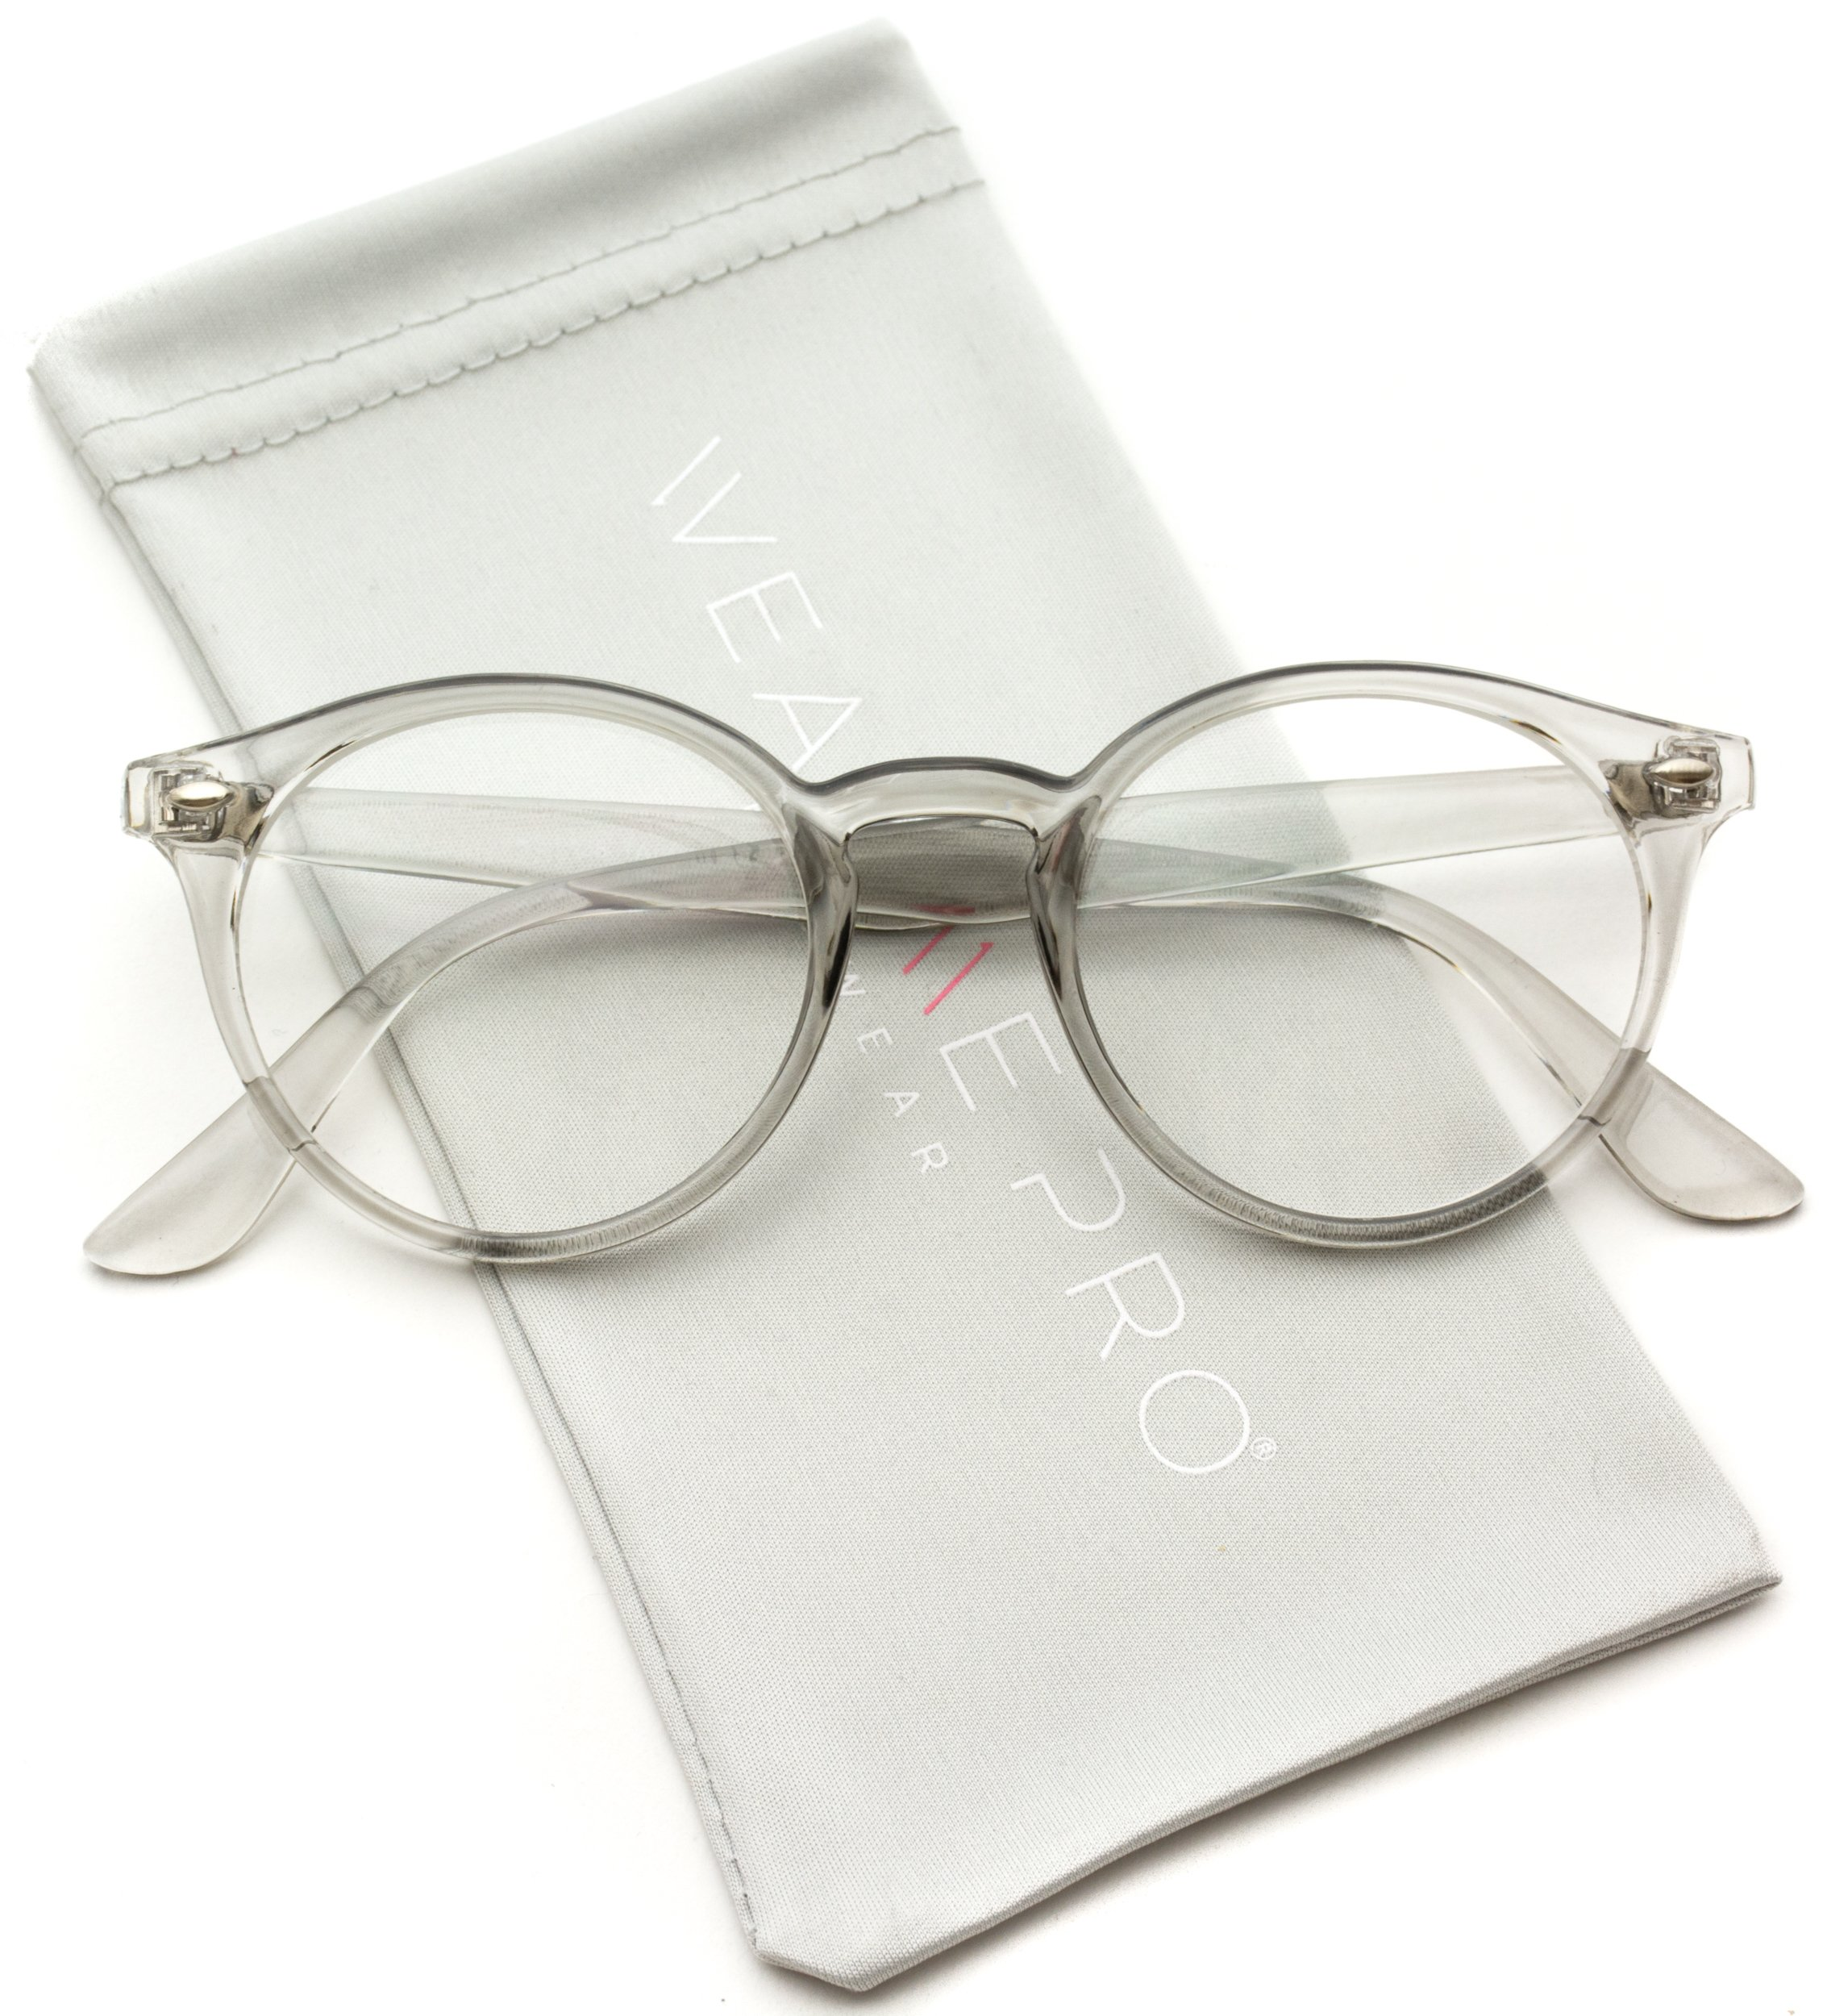 WearMe Pro - Clear Lens Semi Transparent Clear Frame Colorful Glasses by WearMe Pro